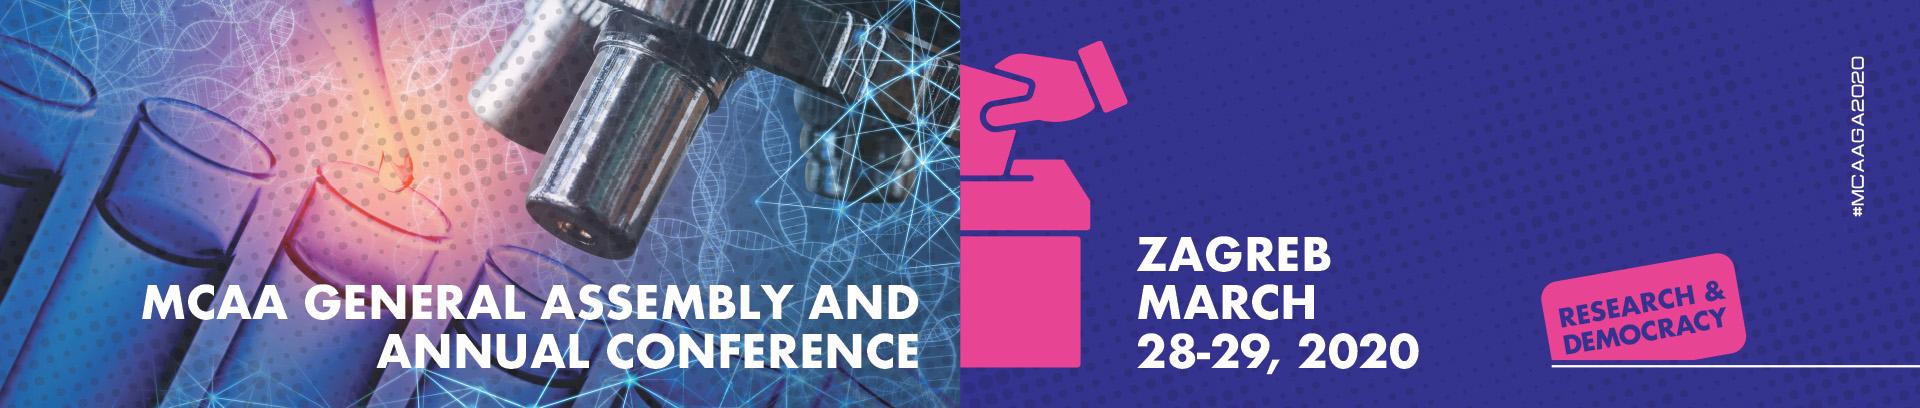 GA conference 2020 banner